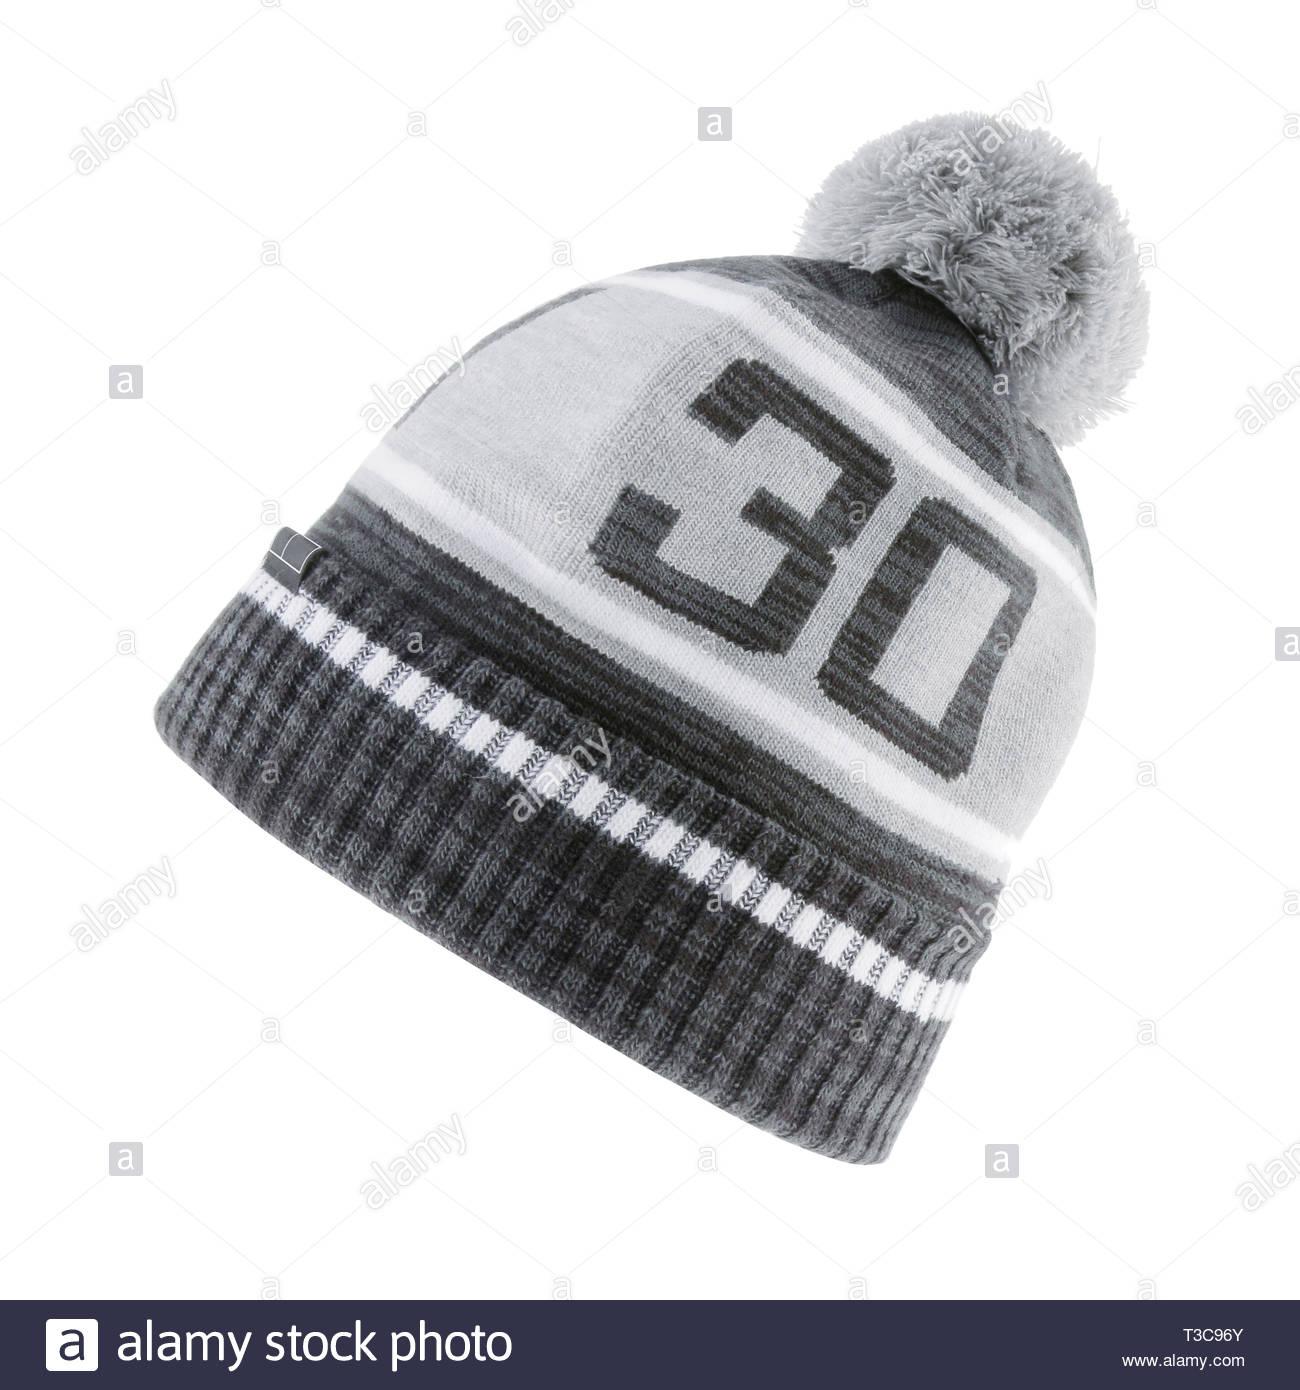 7b2b1b39a9257 Negro y gris brezo Ski Gorro de punto con una piel falsa Pompom aislado  sobre fondo